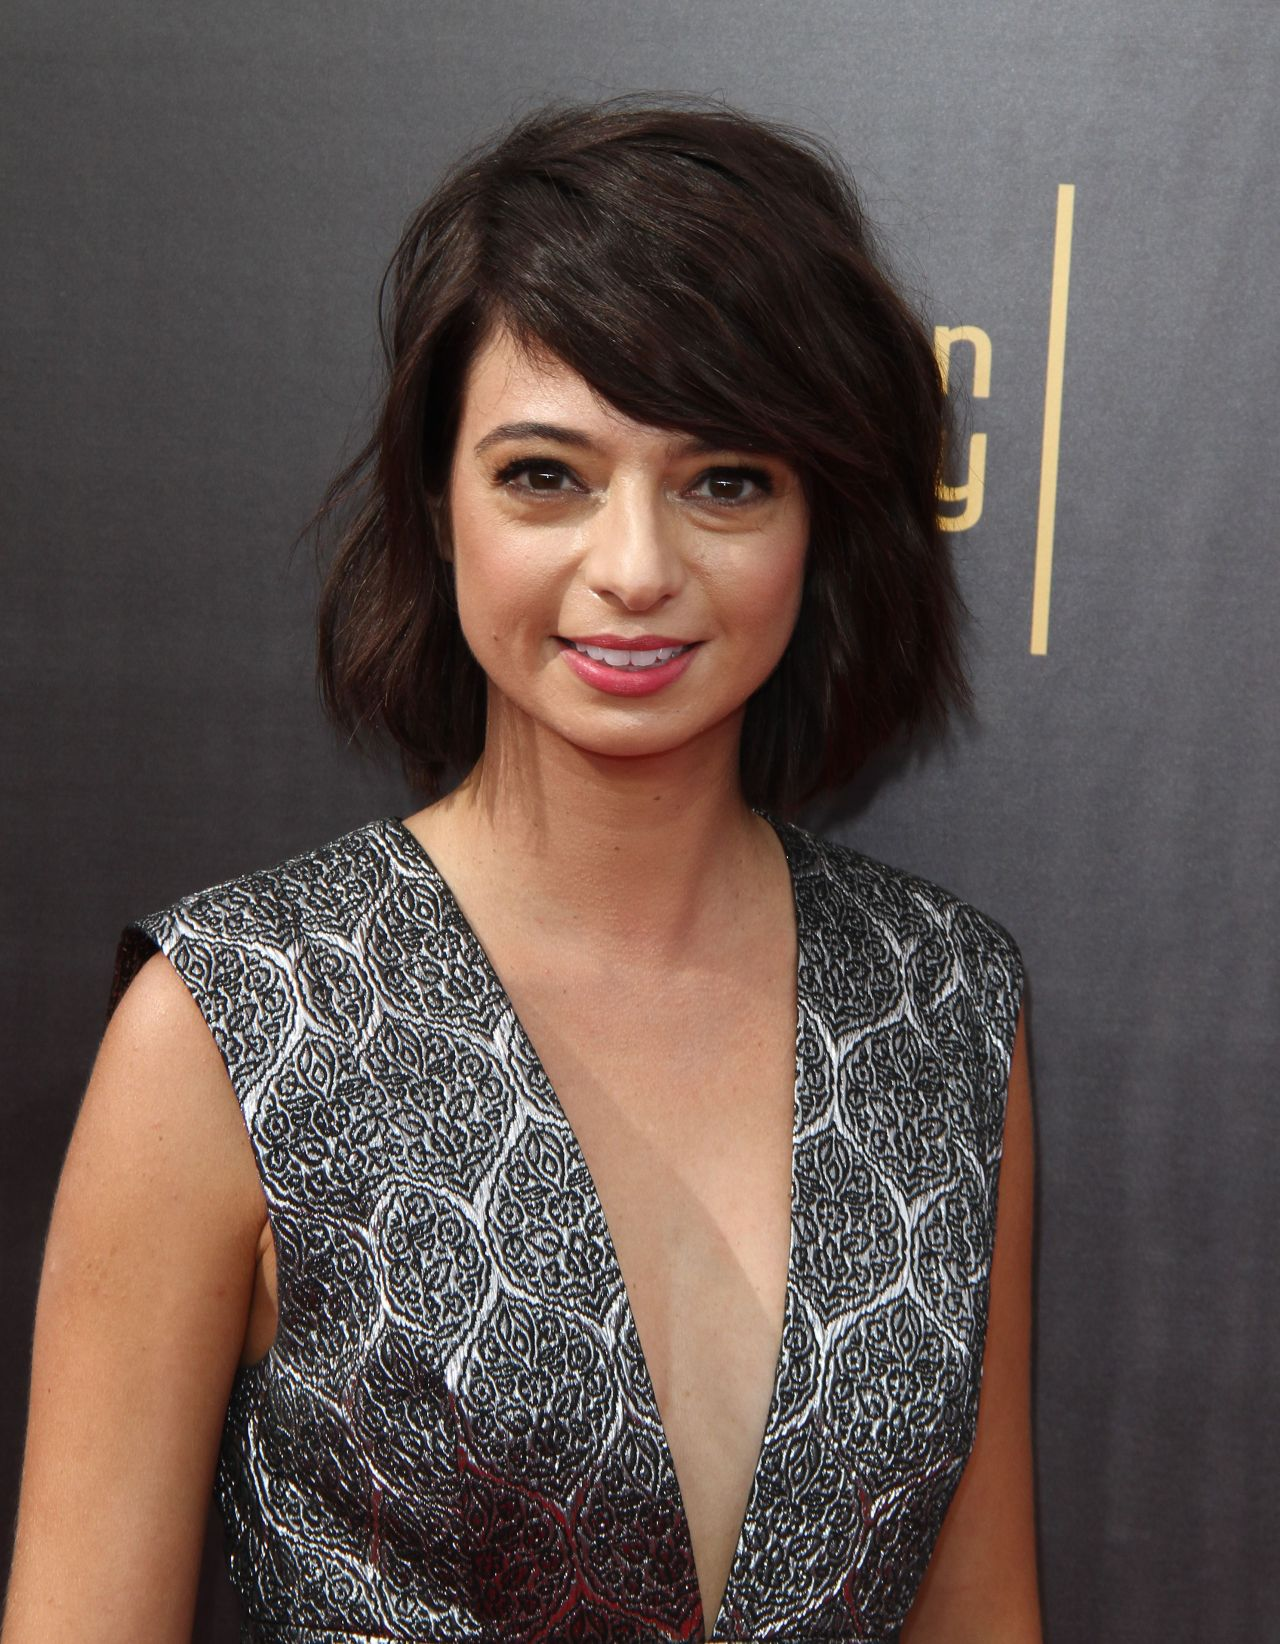 Kate Micucci Creative Arts Emmy Awards In LA Day 1 9